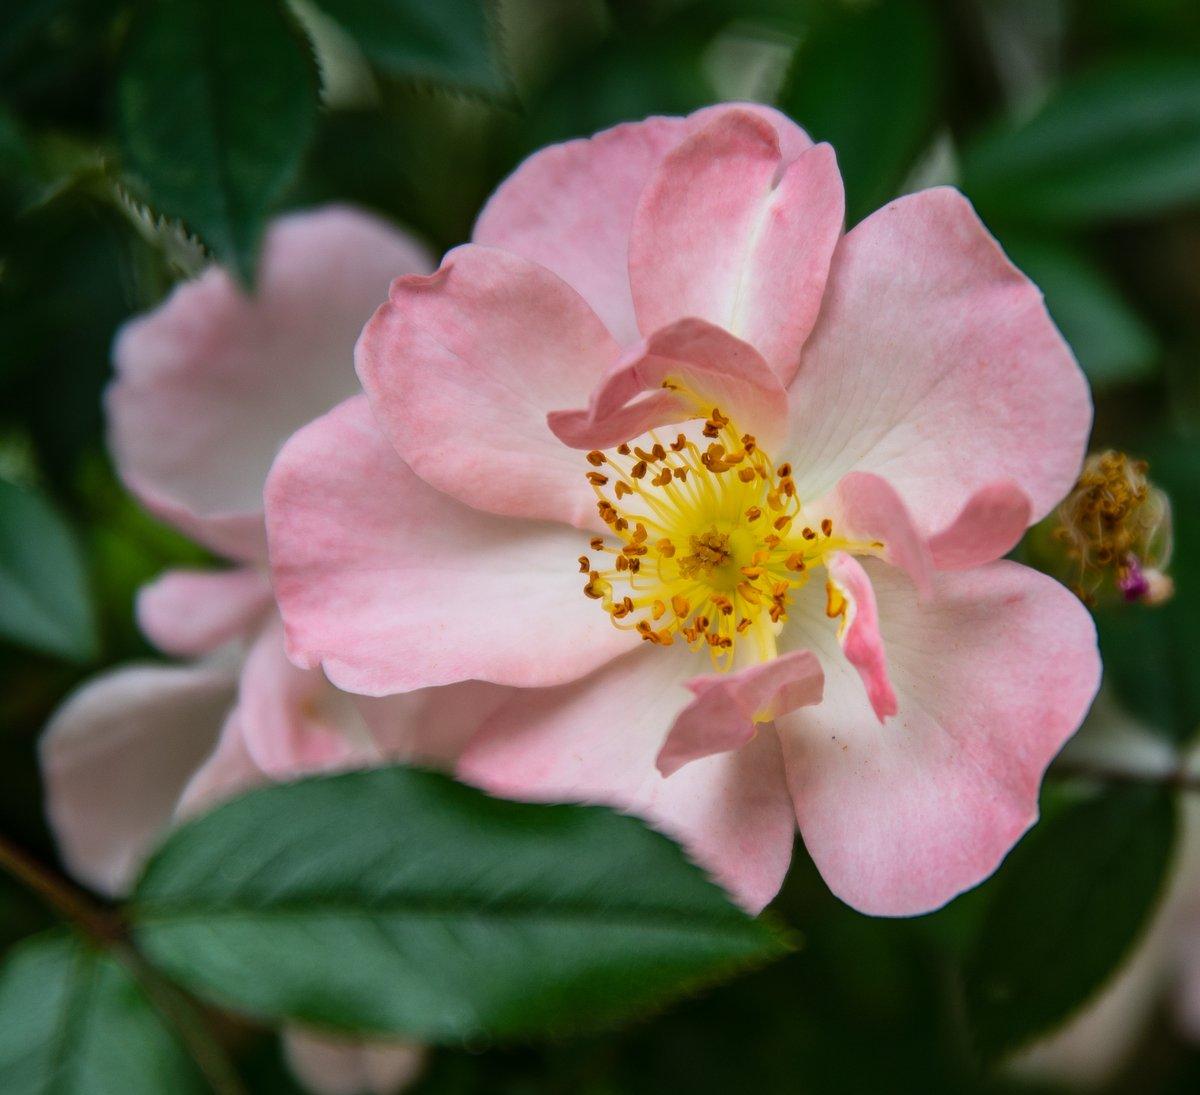 #lente #roses #NaturePhotography #myroses #flower #bloemen #photography #natuurfotografie #Flowers #photo #genieten #fleurs #garden #nature https://t.co/tfRQ3LAnFu